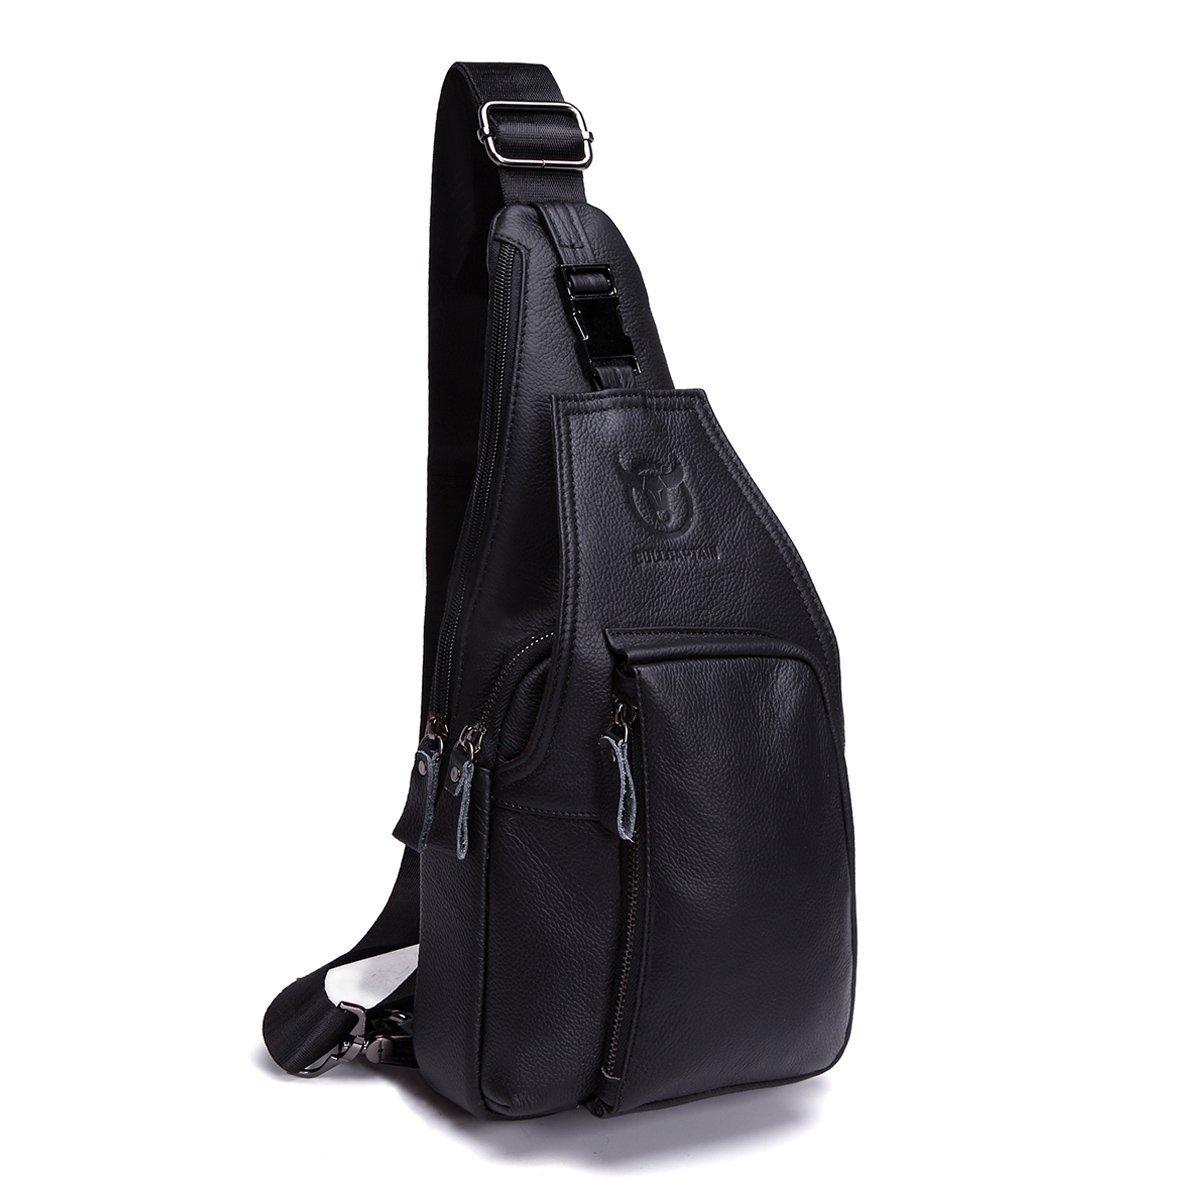 Men Sling Bags, Charminer Genuine Leather Crossbody Shoulder Chest Bag Business Casual Backpack Outdoor Travel Daypack black Besttoanywhere-CO. Ltd CHARMINERbesttoanywhereca13